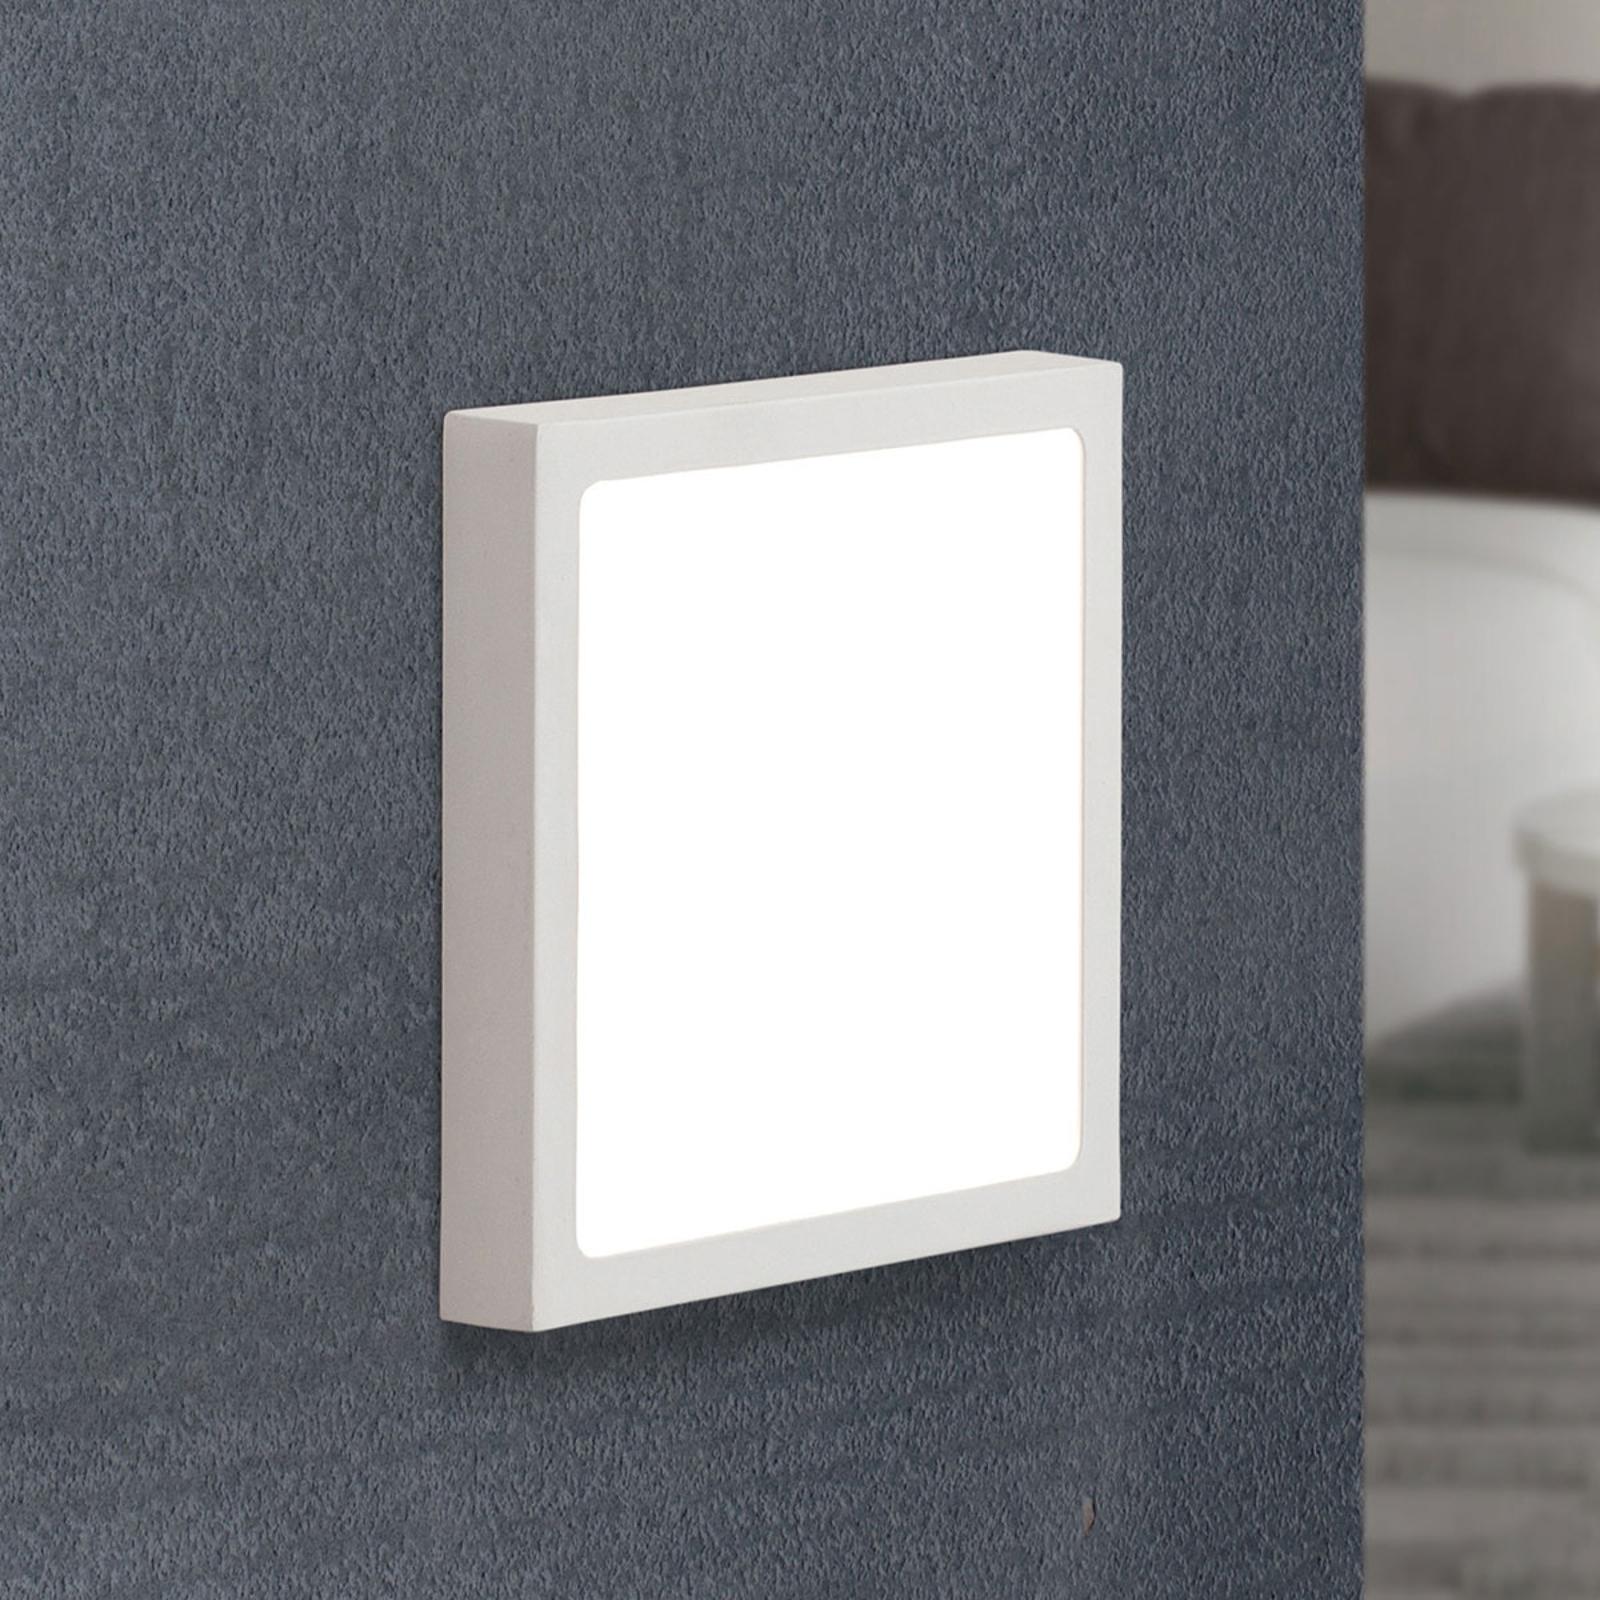 LED-Wandleuchte Vika, Quadrat, weiß, 18x18cm